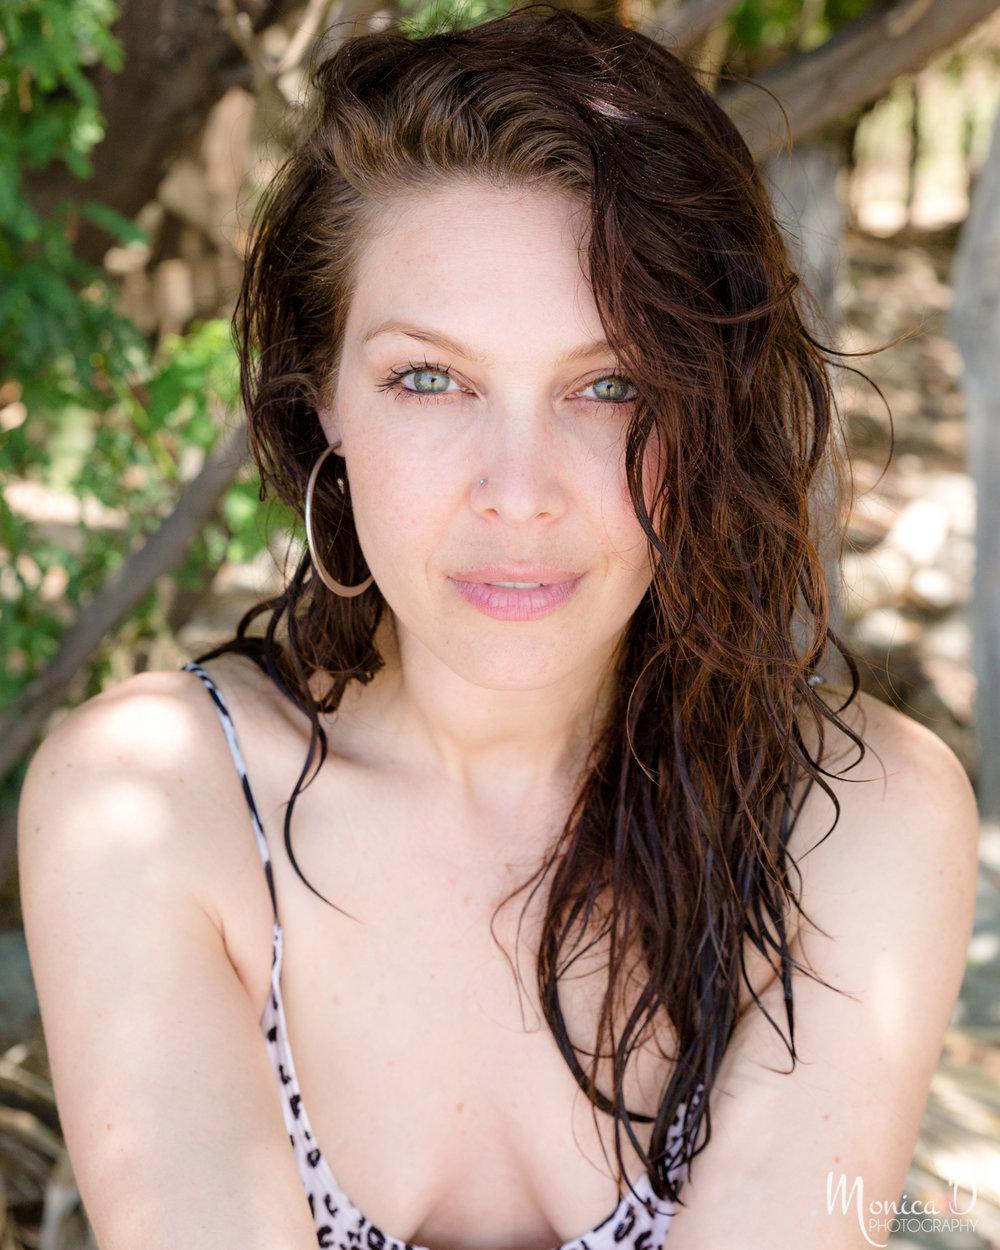 Alaina Huffman - February 2018